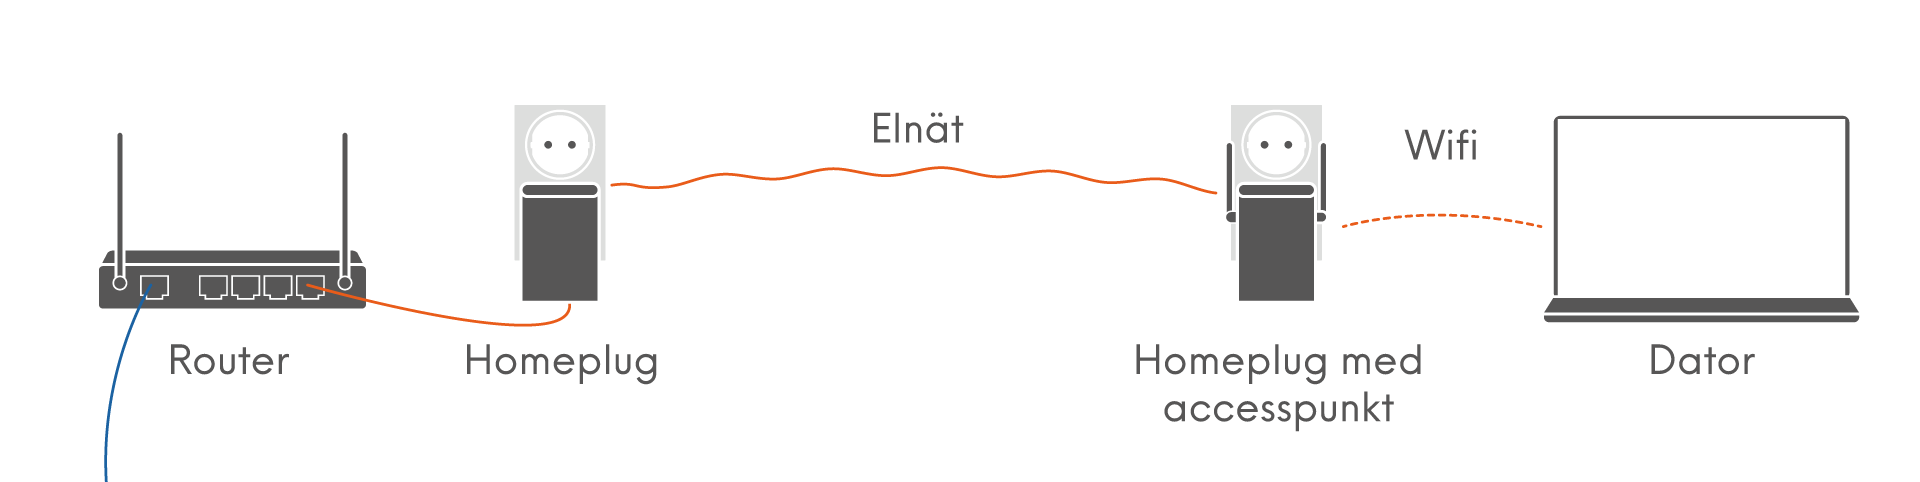 Homeplug-ansluten accesspunkt